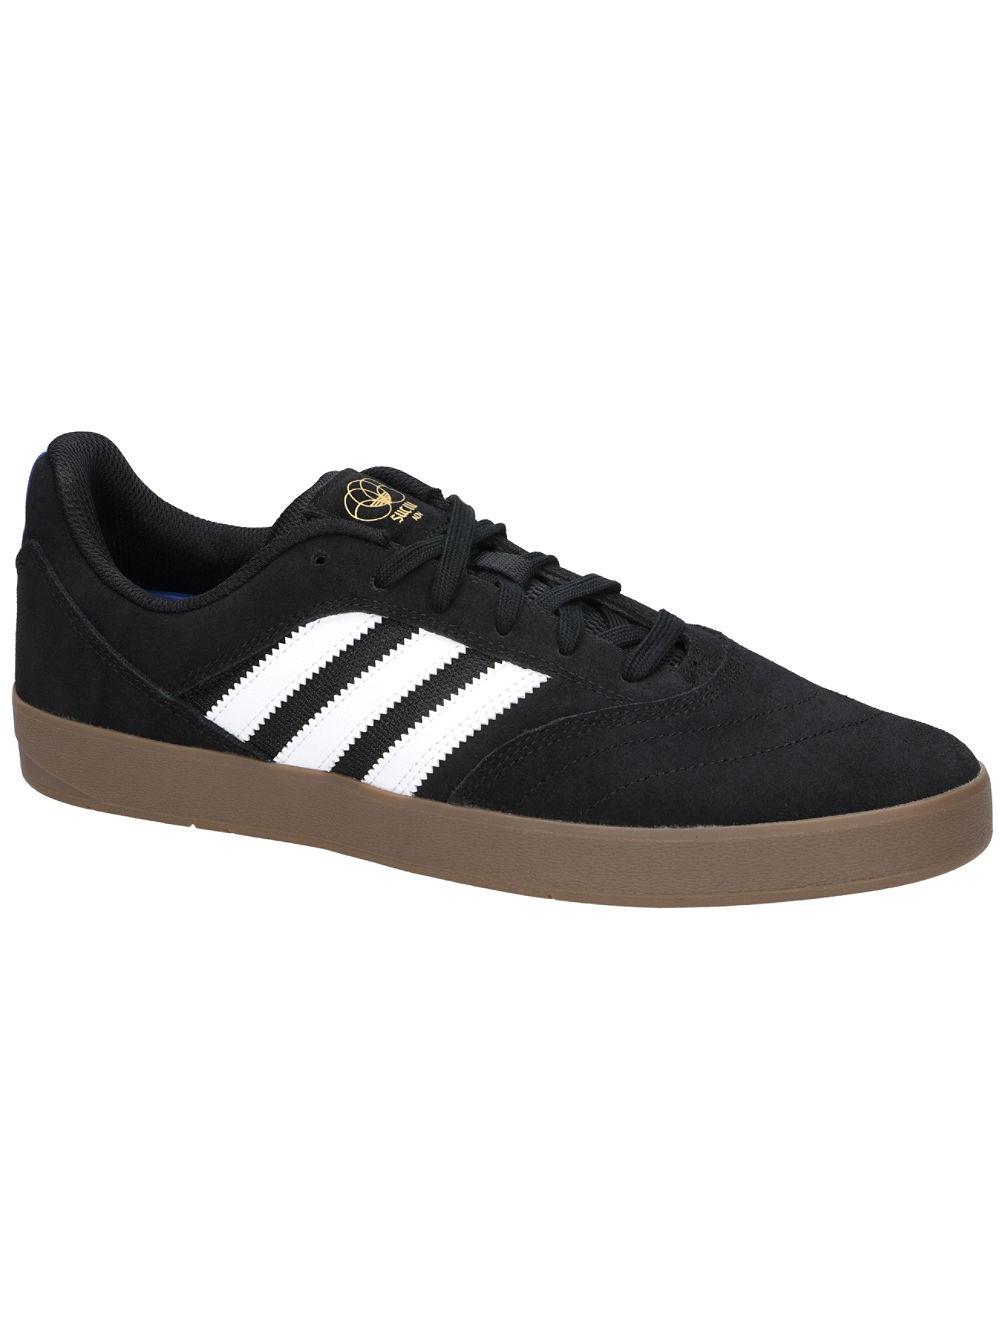 new product 42bca ce6a1 Buy adidas Skateboarding Suciu ADV II Skate Shoes online at blue-tomato.com